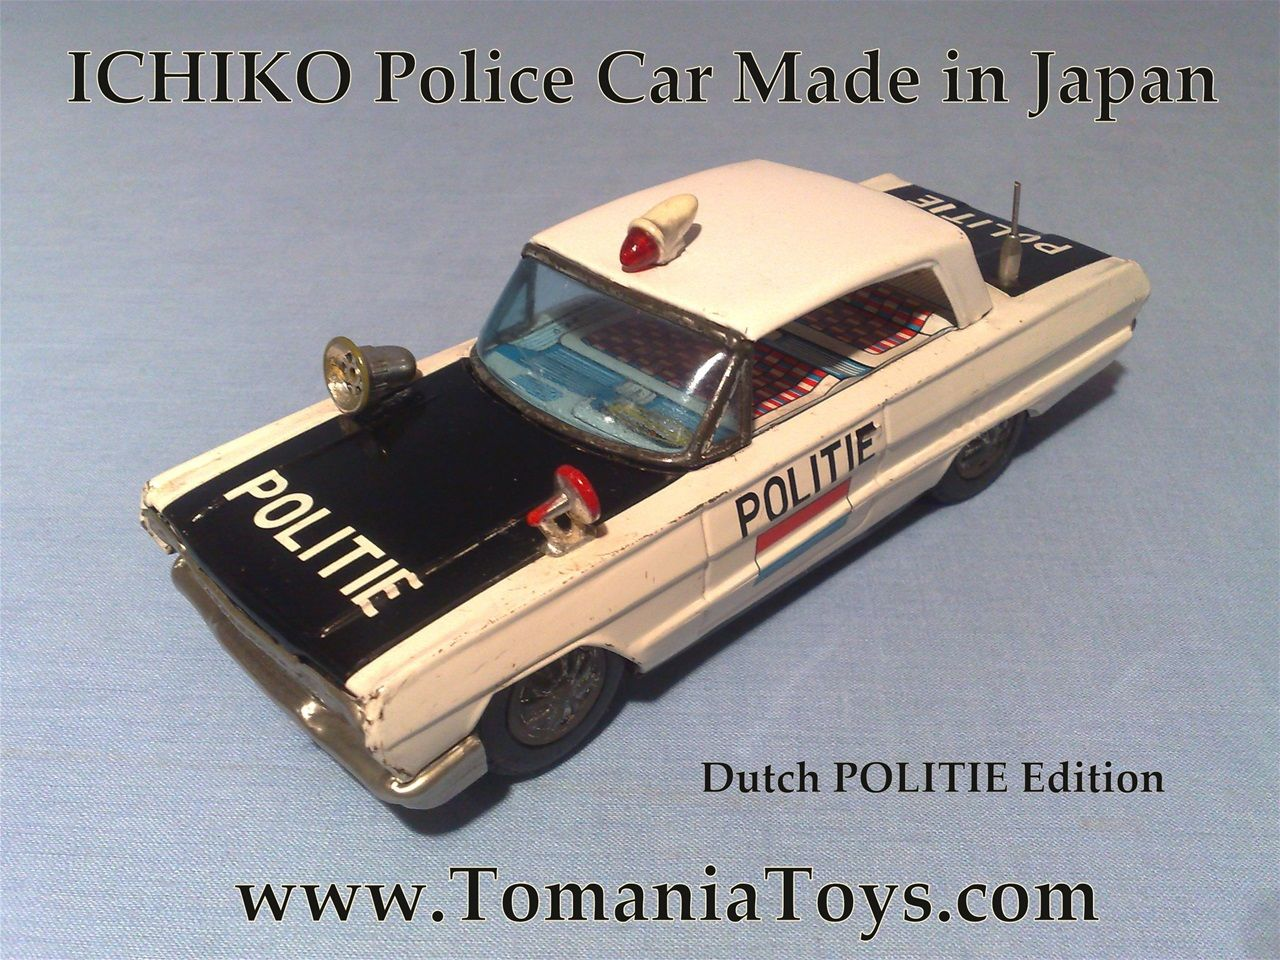 ICHIKO CHEVROLET BEL AIR 1963 Police Car Made in Japan NL